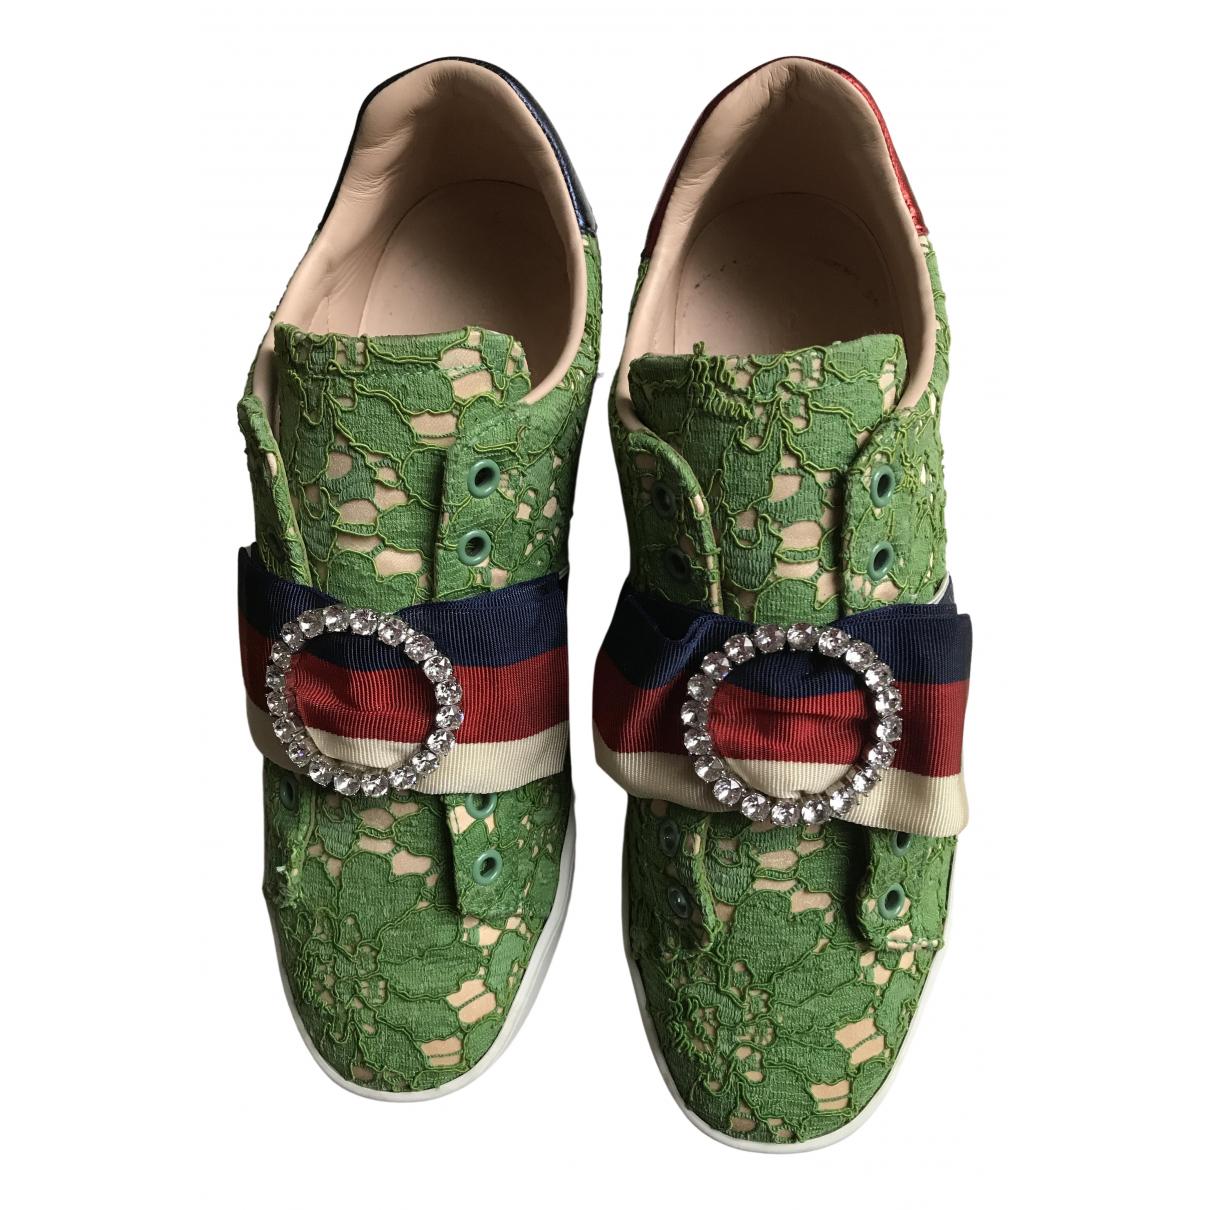 Gucci \N Sneakers in  Gruen Leder